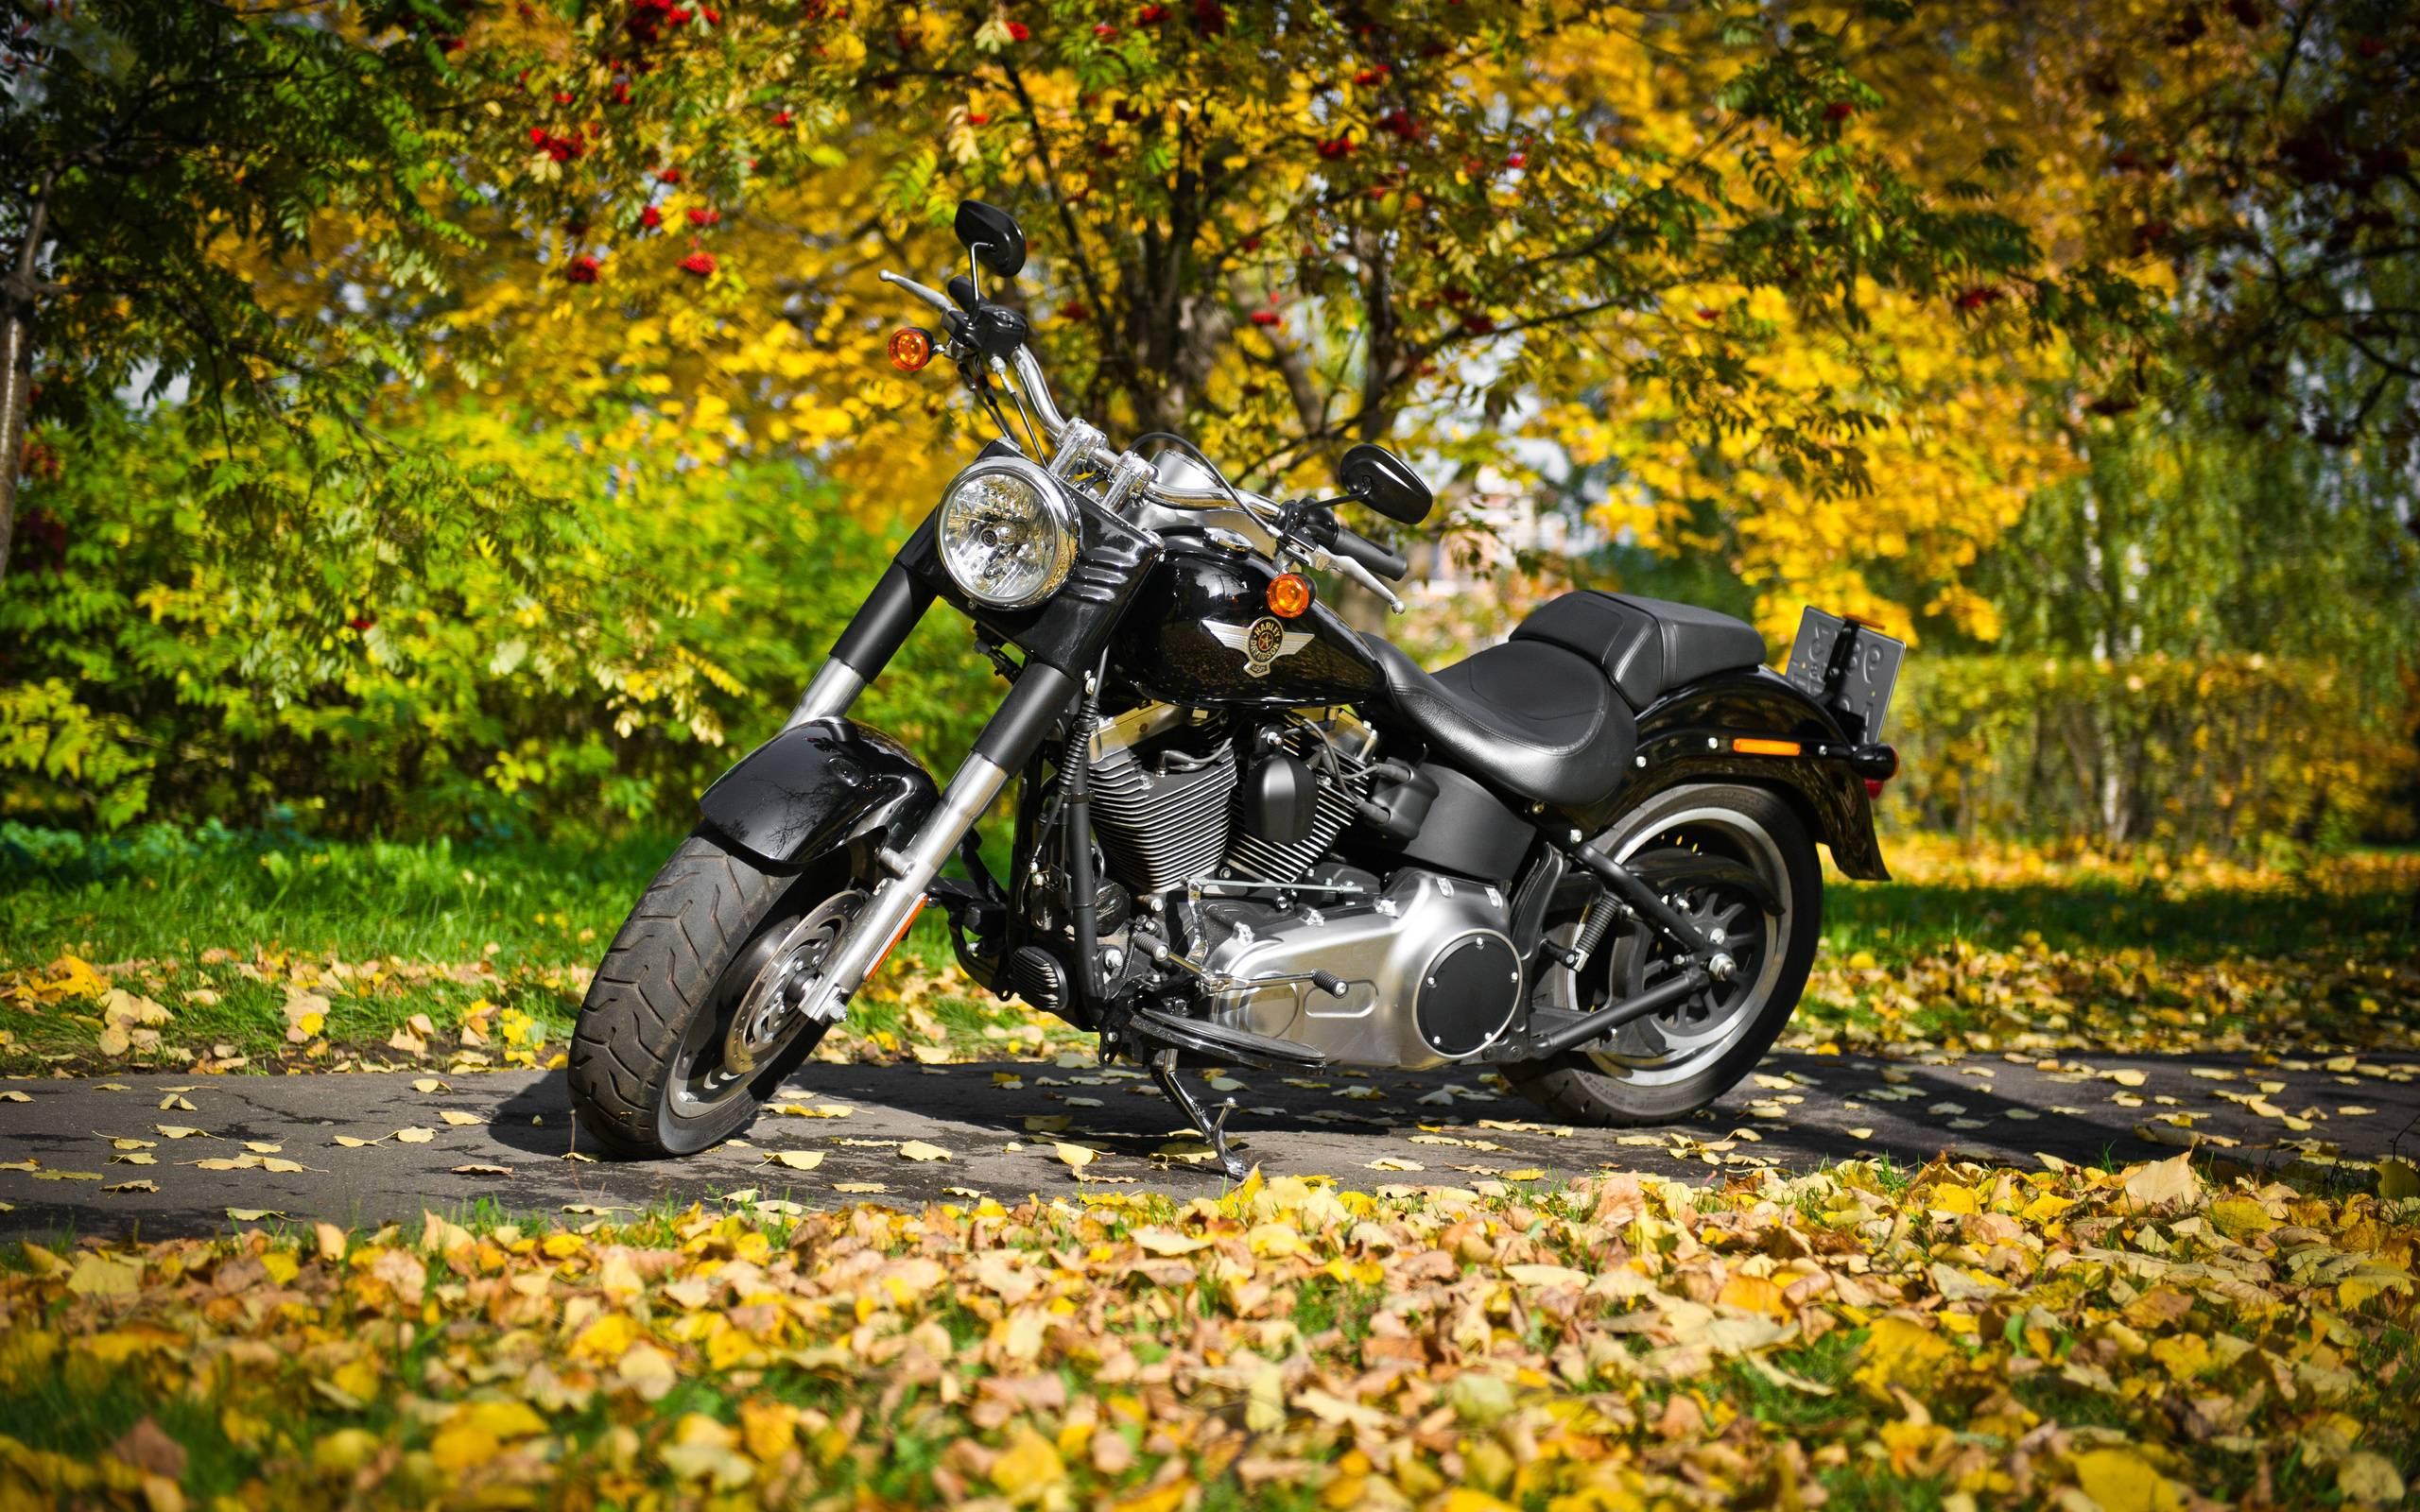 Download Wallpaper Harley Davidson Fat Boy Motorcycle Grass